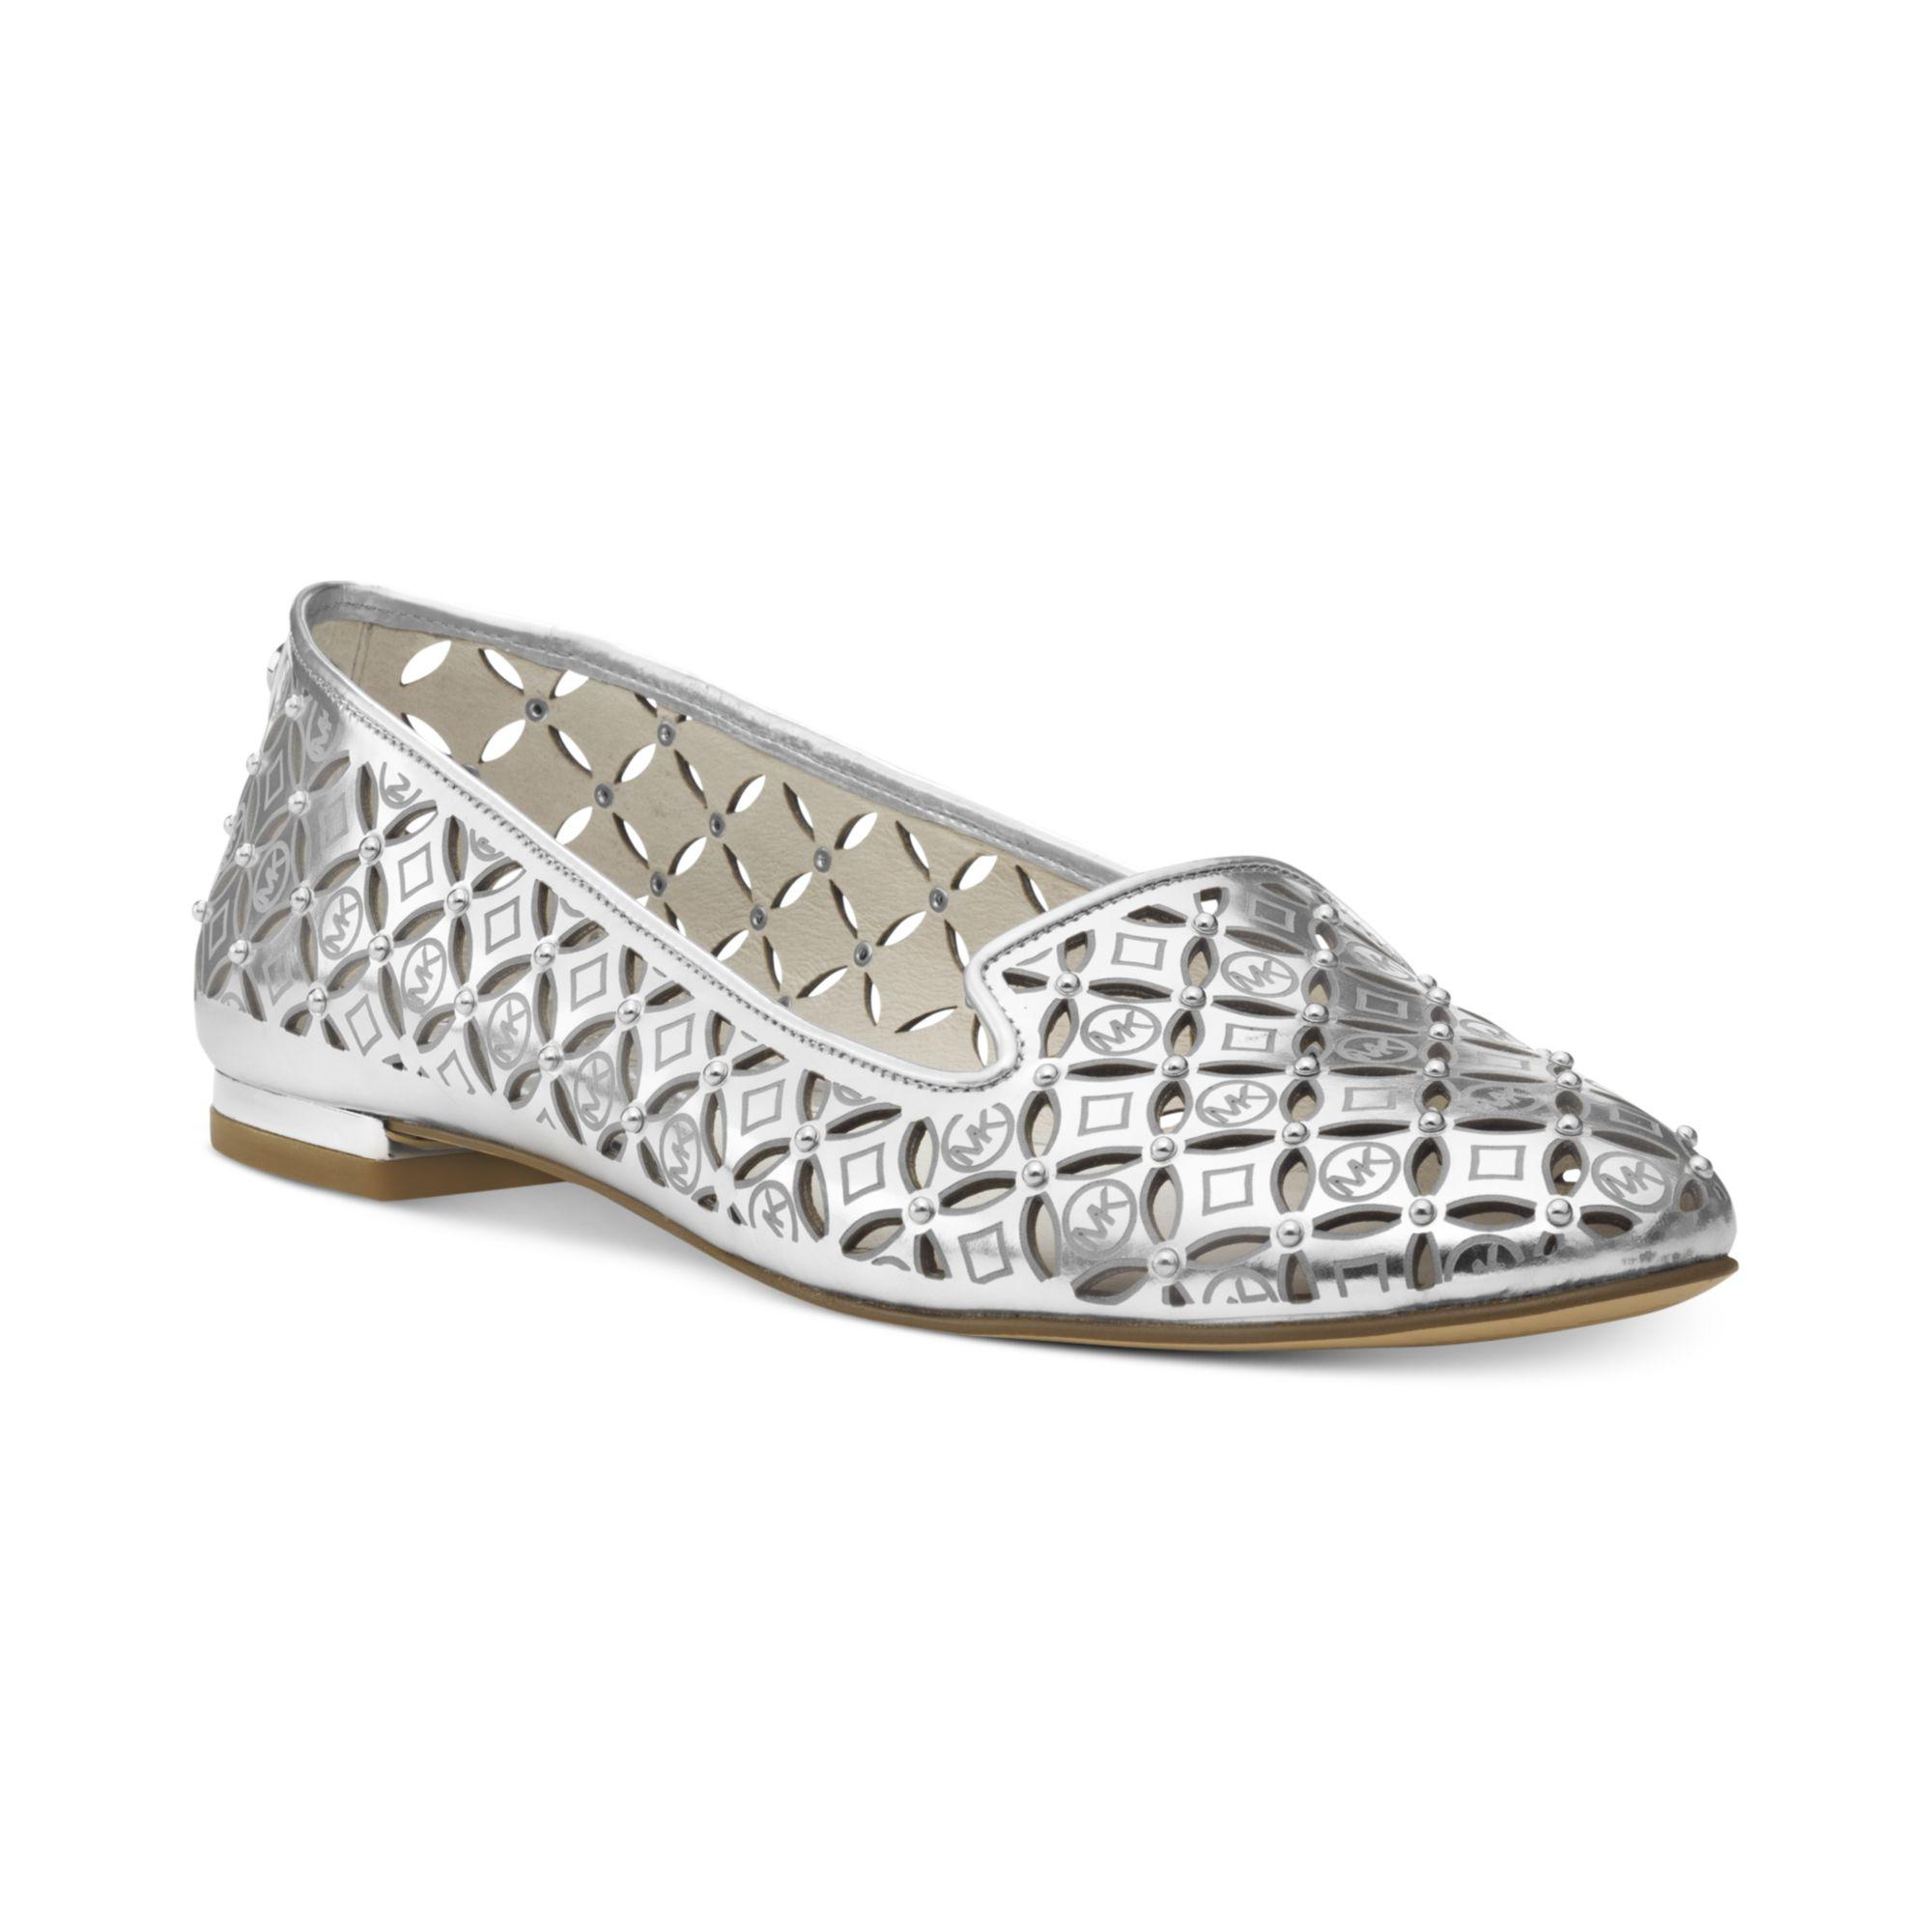 Michael Kors Shoes Flats